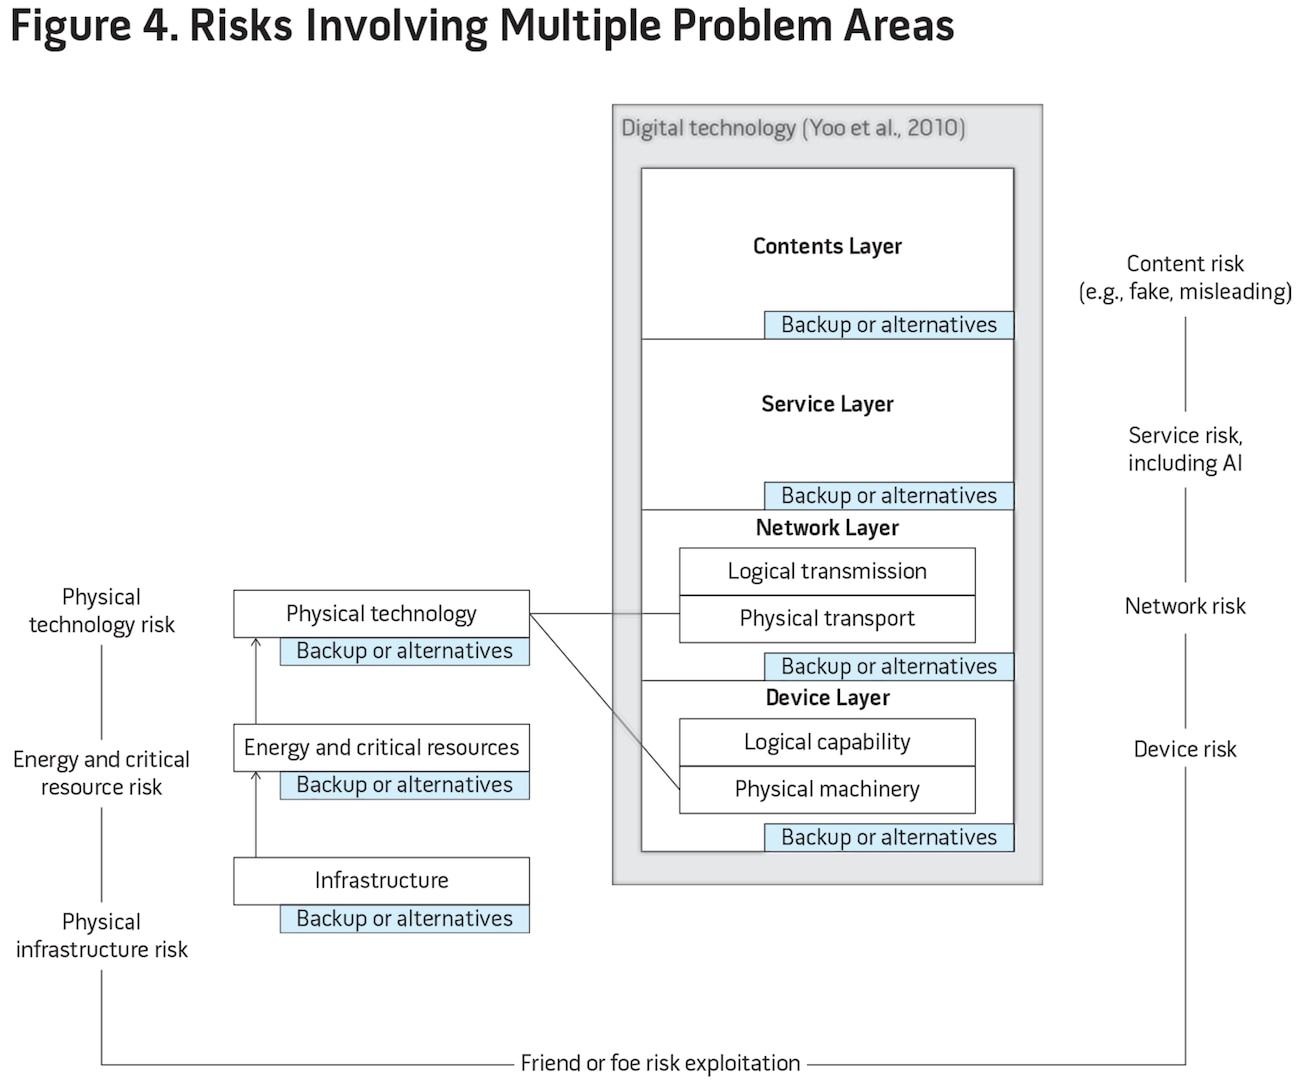 Figure 4. Risks Involving Multiple Problem Areas